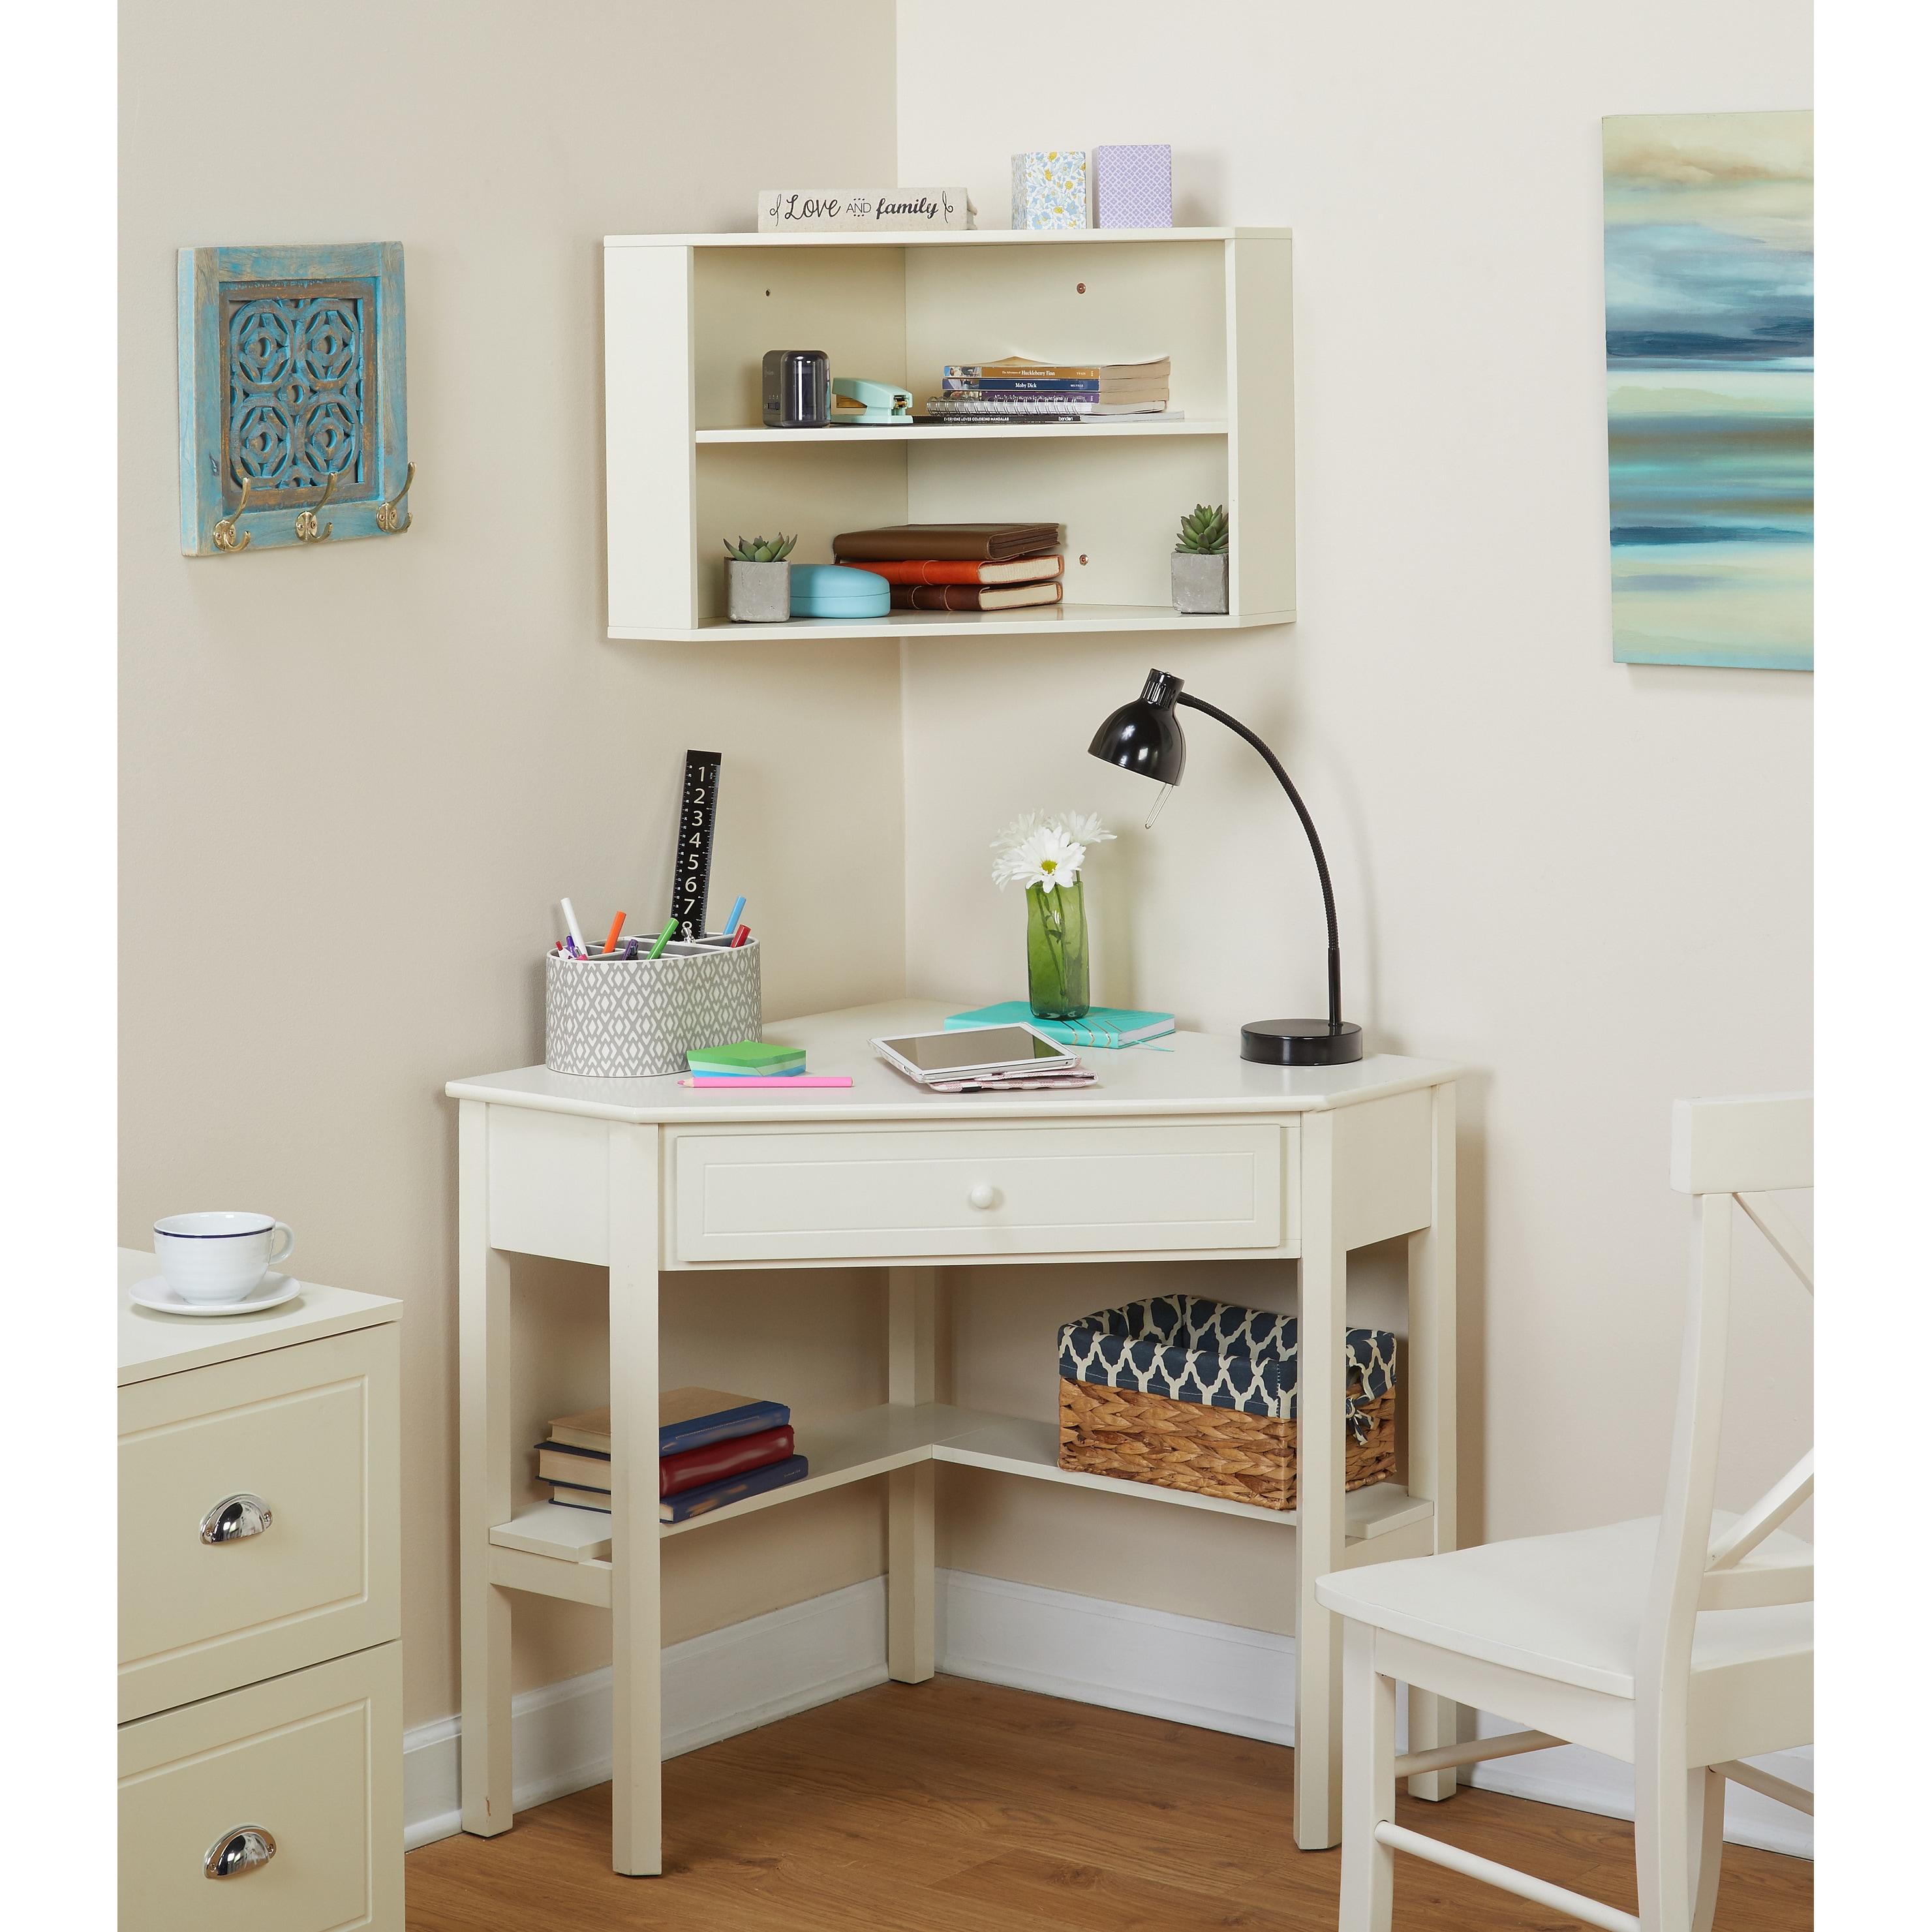 White Corner Desk In Simple Living Corner Desk And Hutch Set Buy White Desks Online At Overstockcom Our Best Home